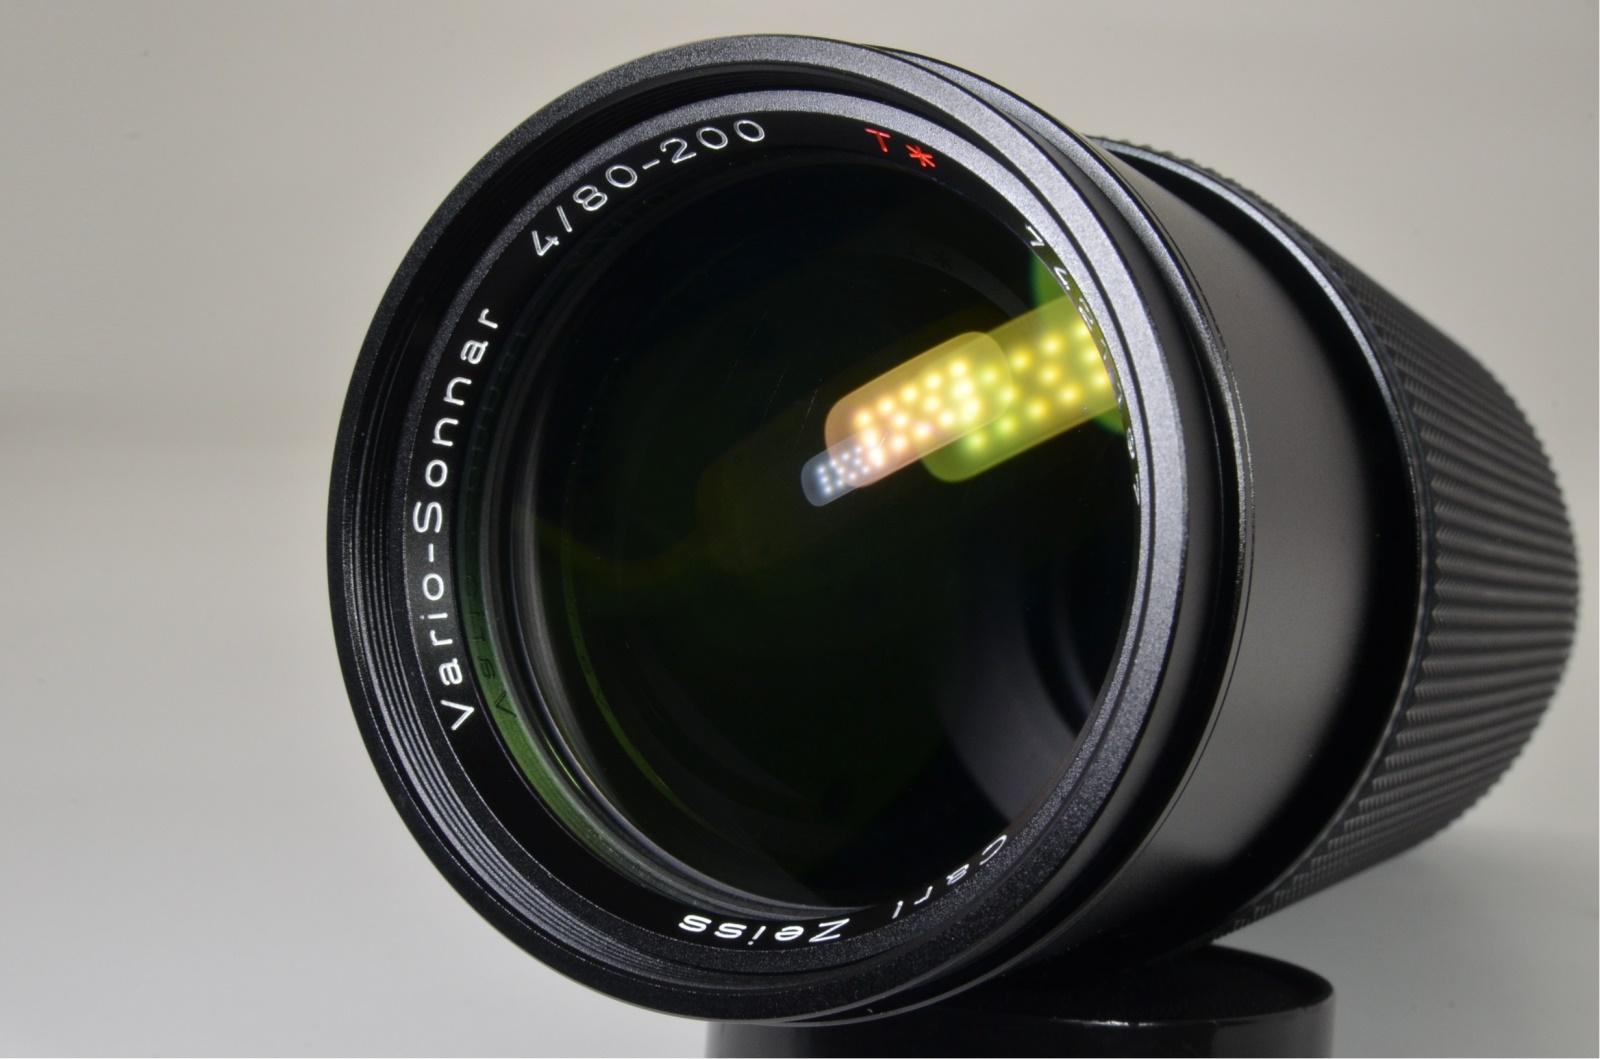 contax carl zeiss vario-sonnar t* 80-200mm f4 mmj japan lens hood shooting tested